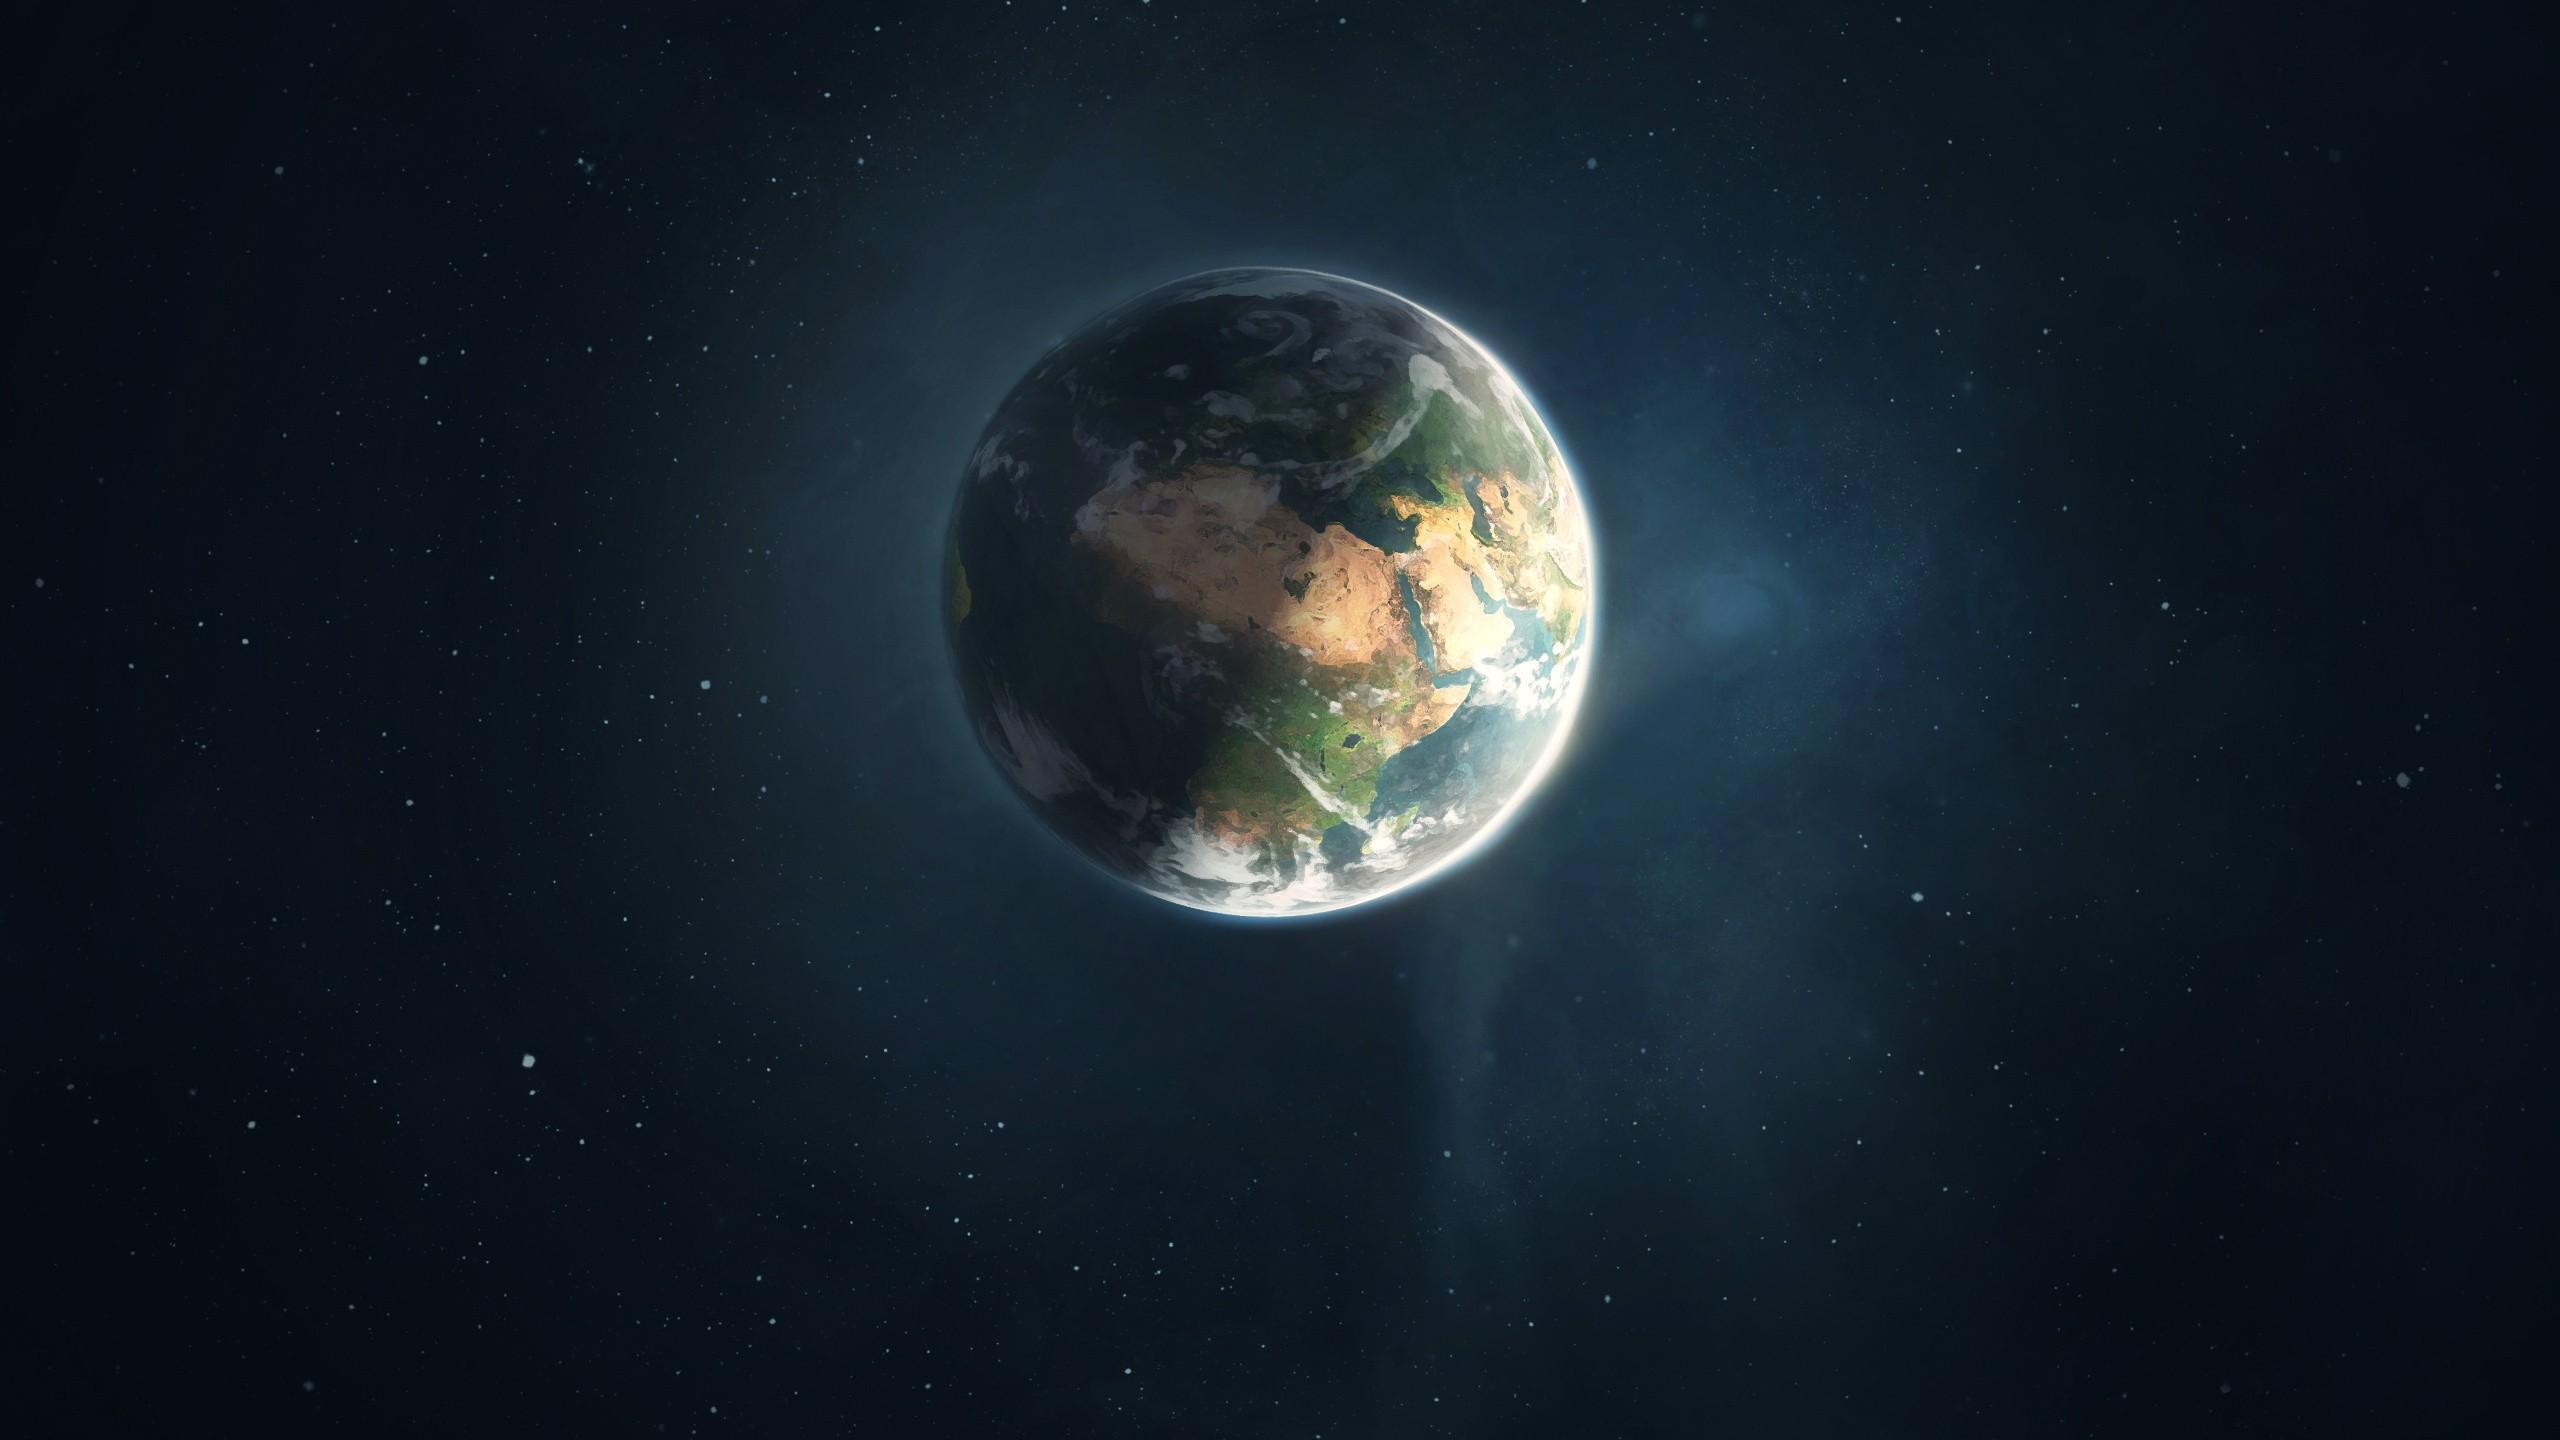 space art space planet digital art earth